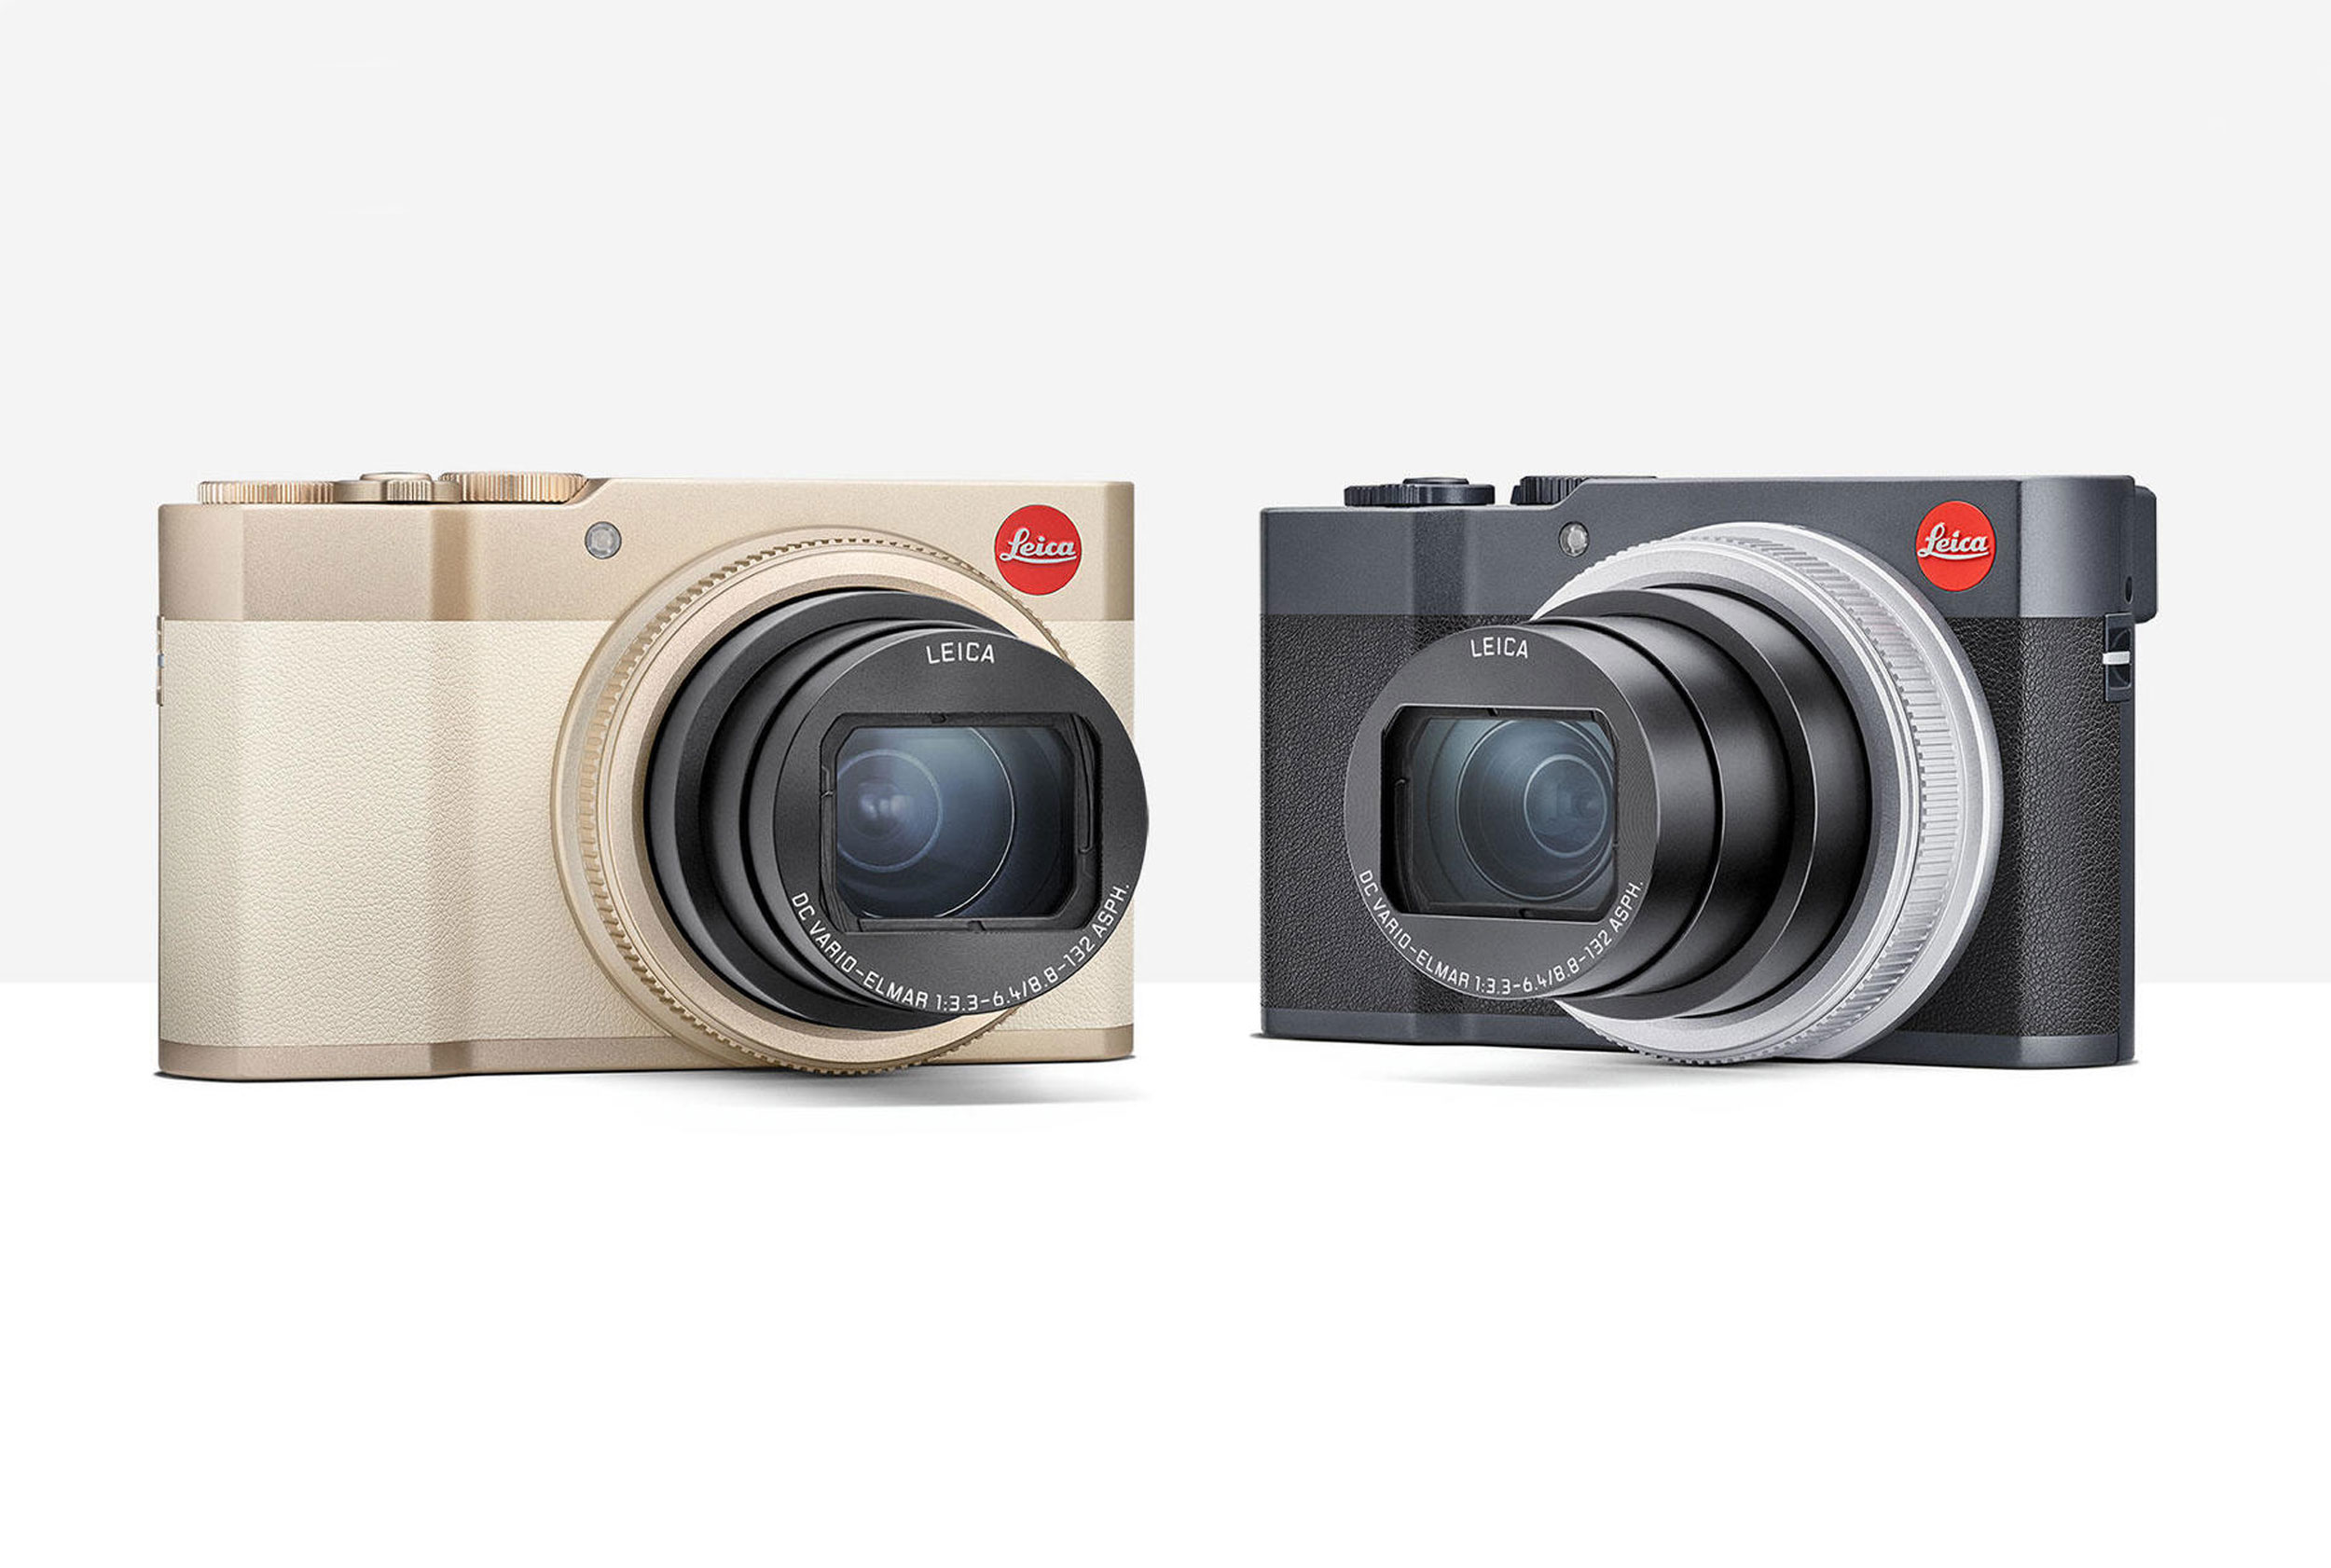 Leica noctivid ferngläser leica sportoptik all hunters